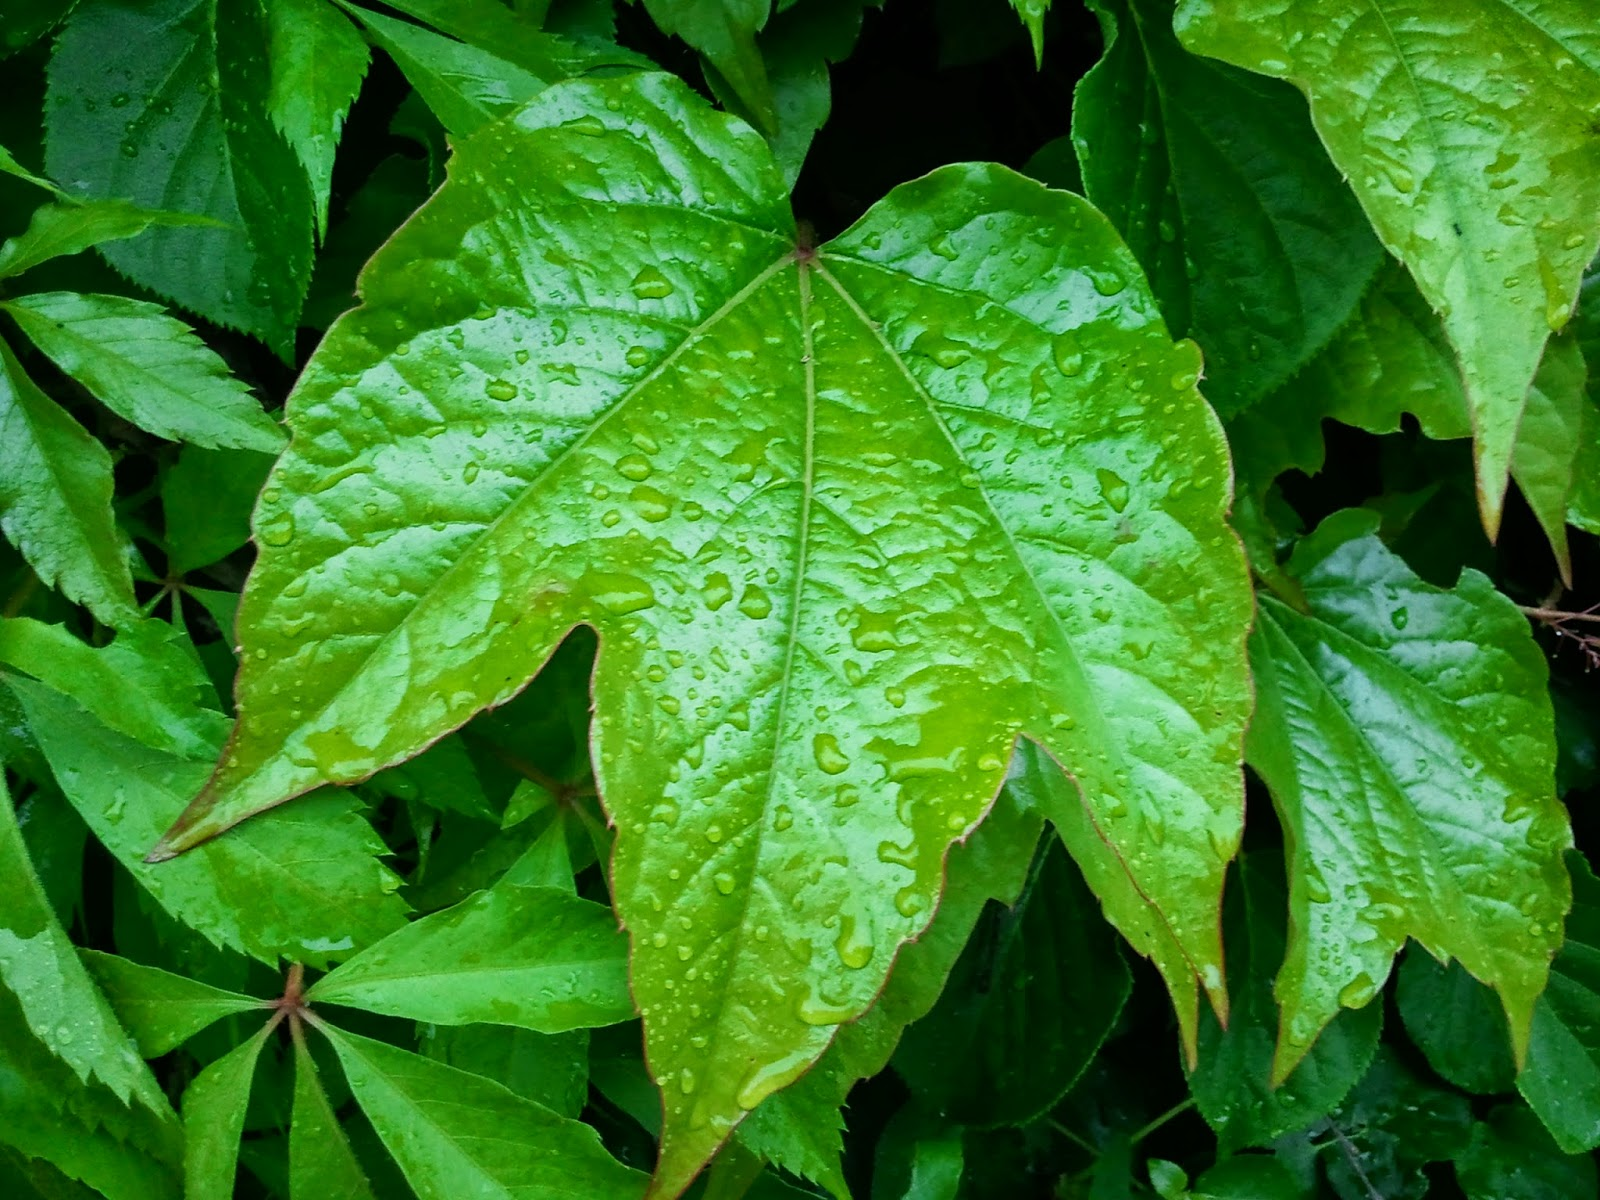 texture, foliage, foliage texture